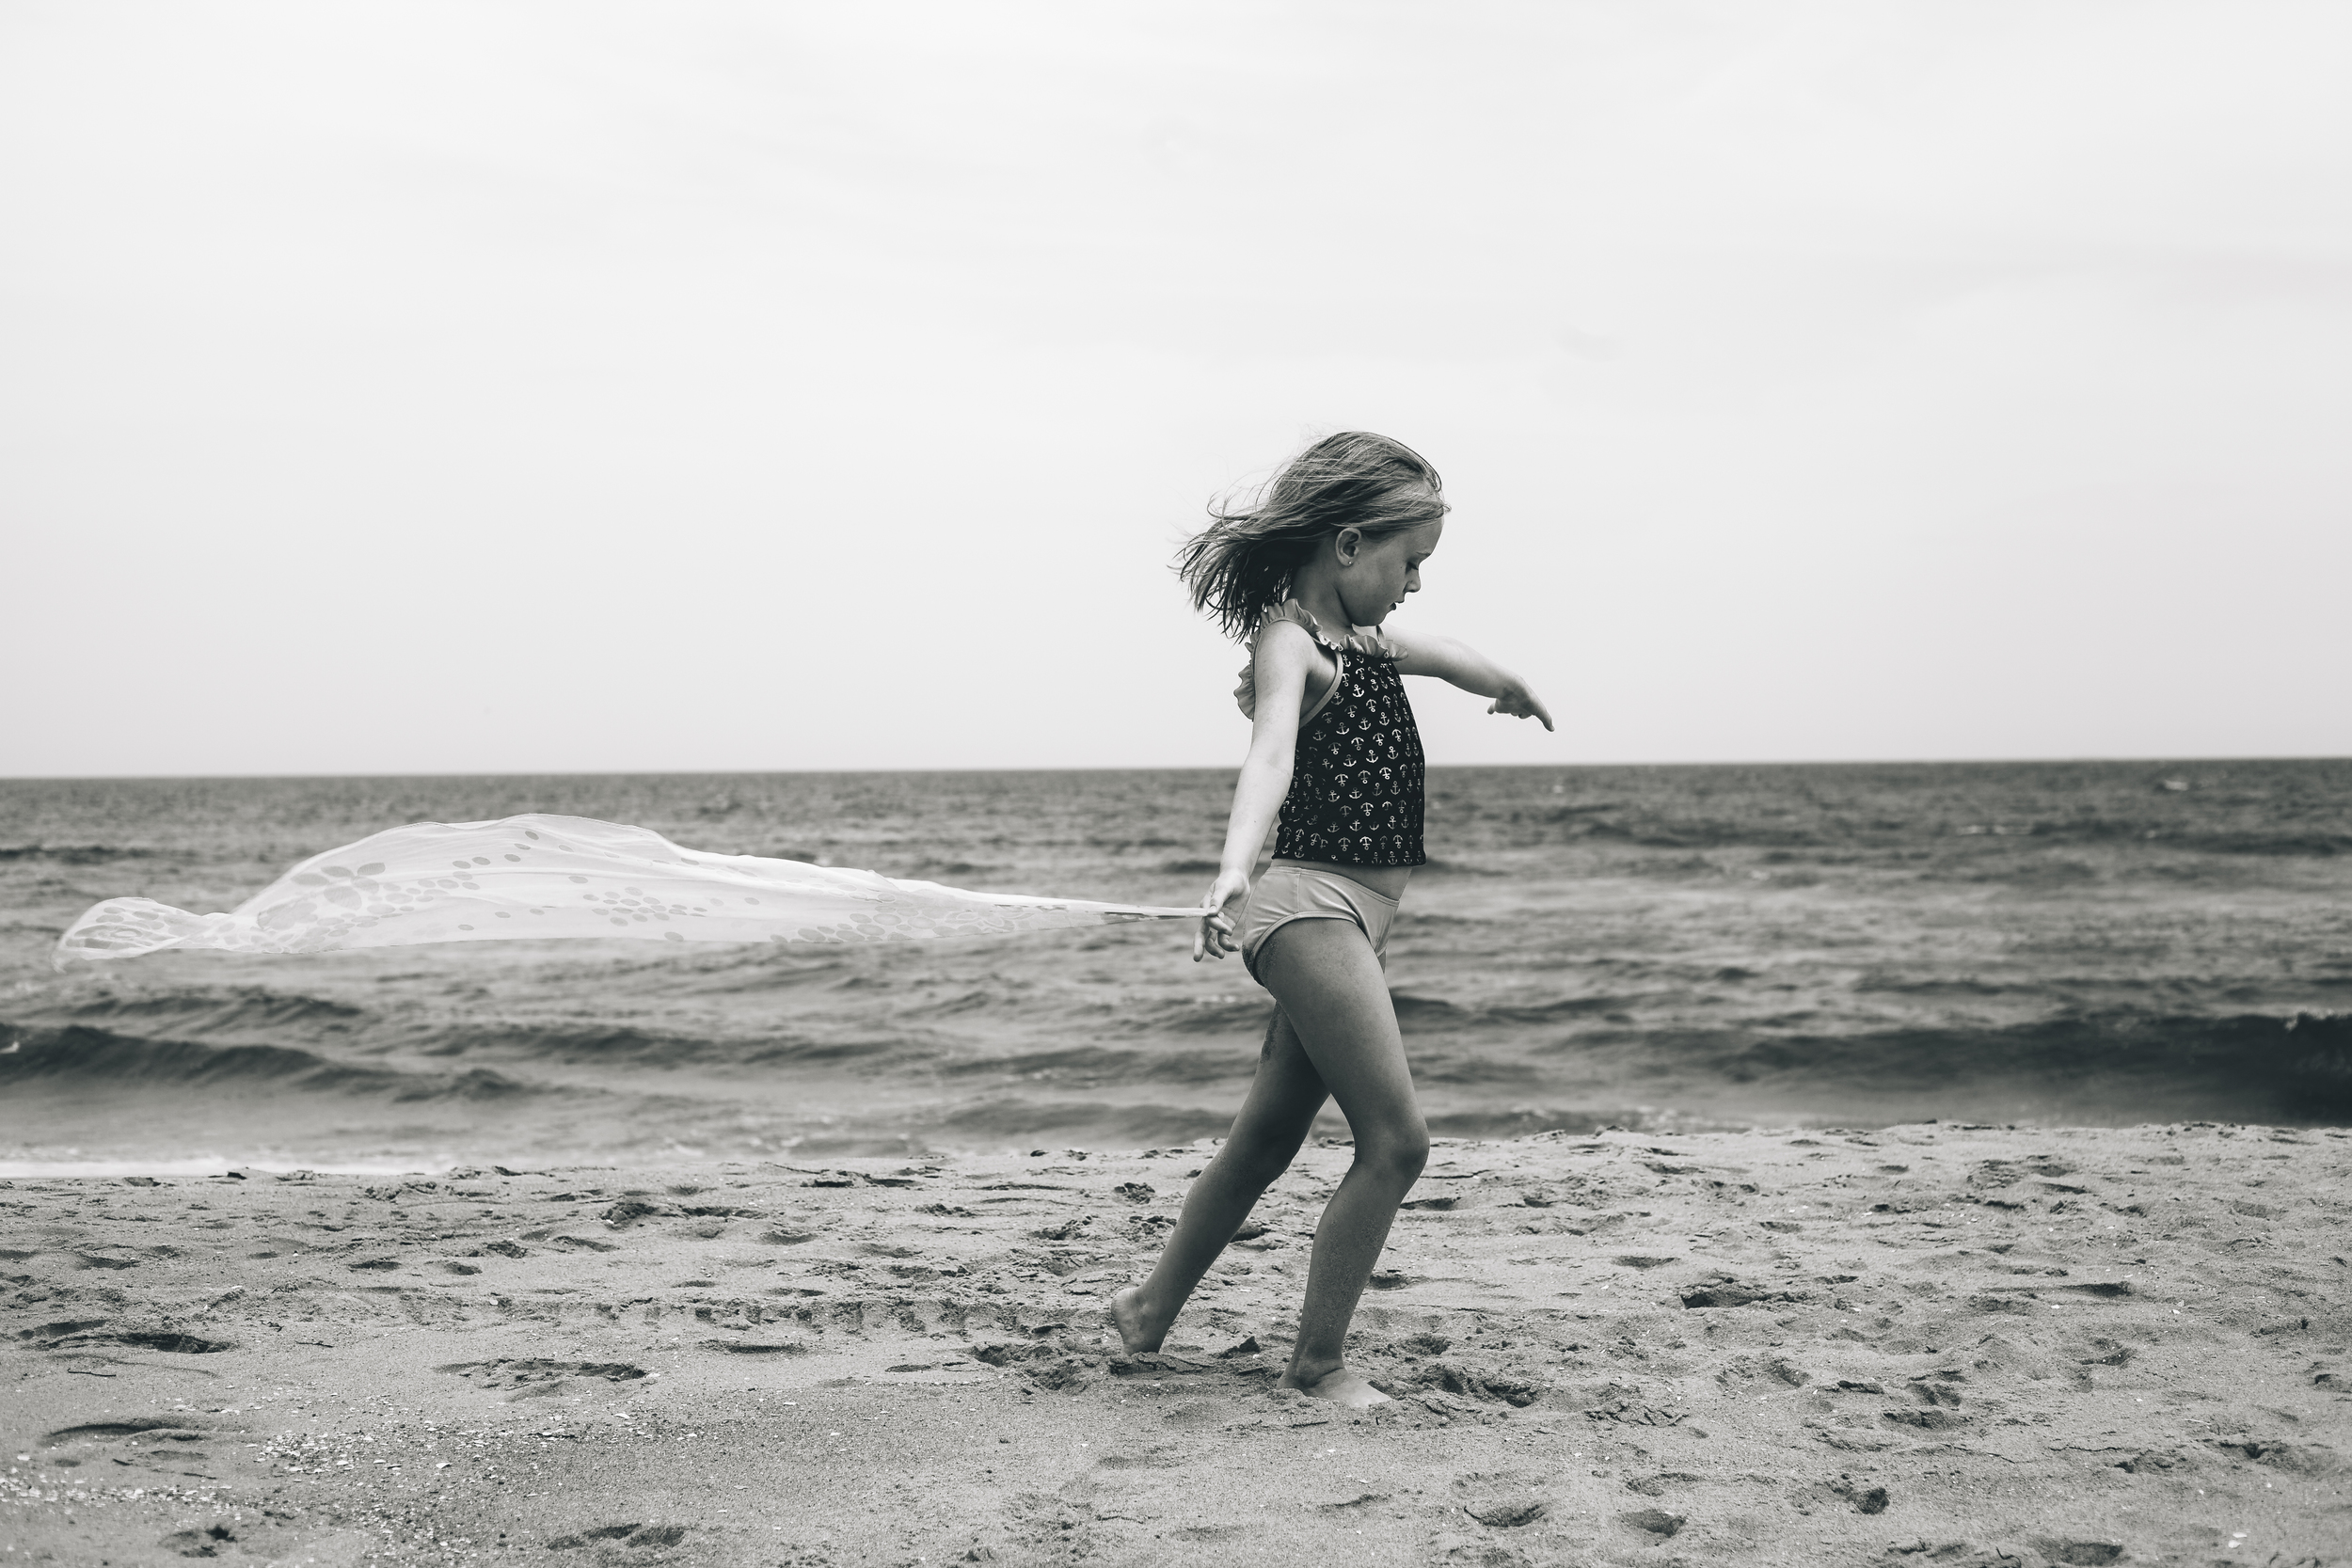 20160701_virginia beach_4774virginia beach vacation .jpg